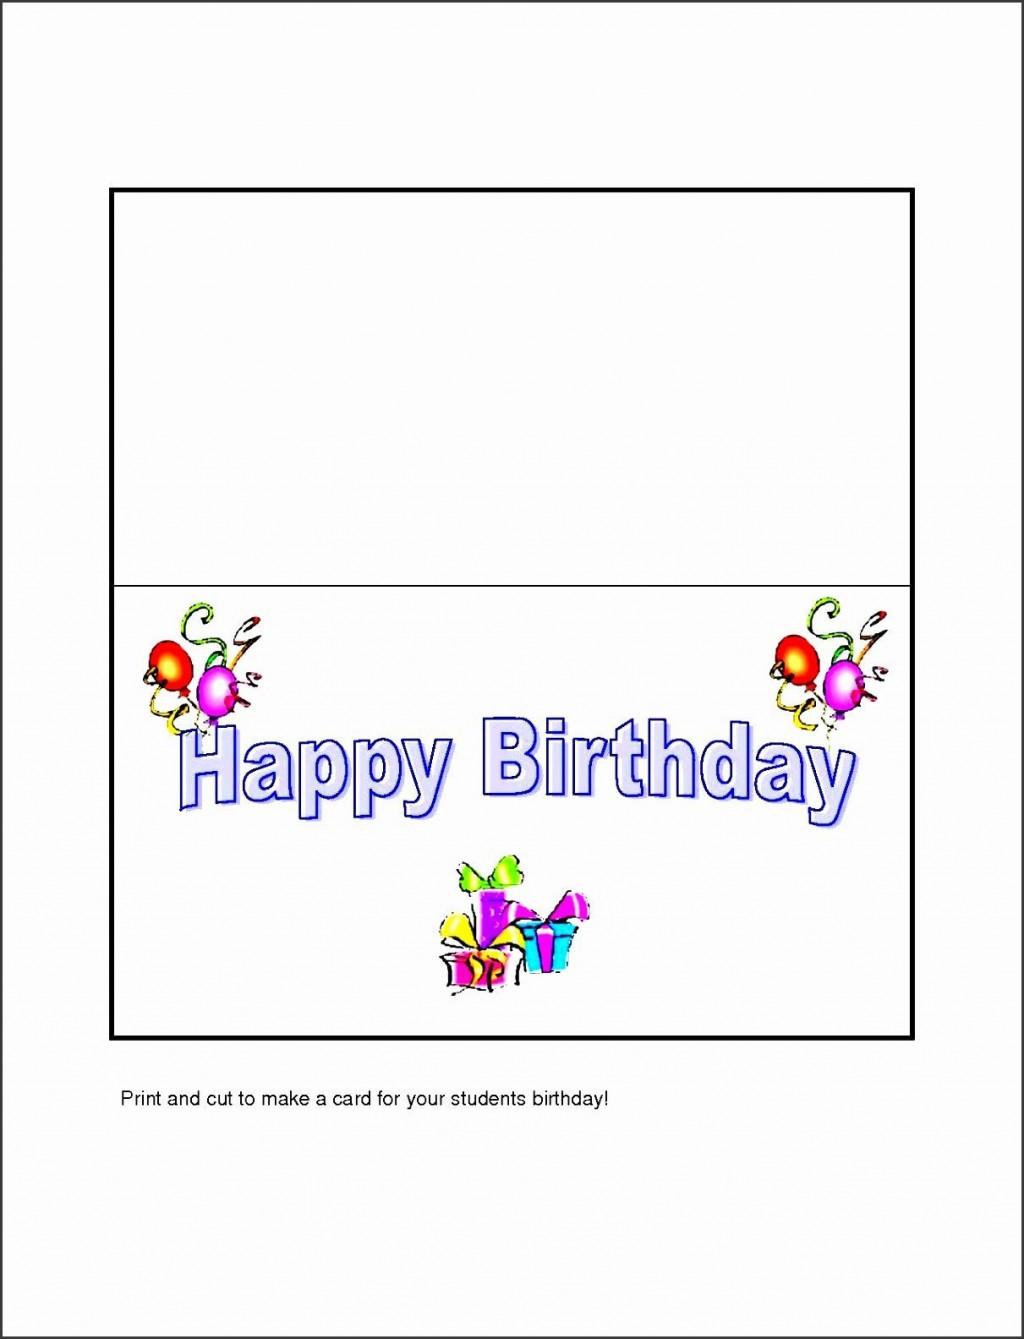 008 Marvelou Blank Birthday Card Template For Word Idea  FreeLarge